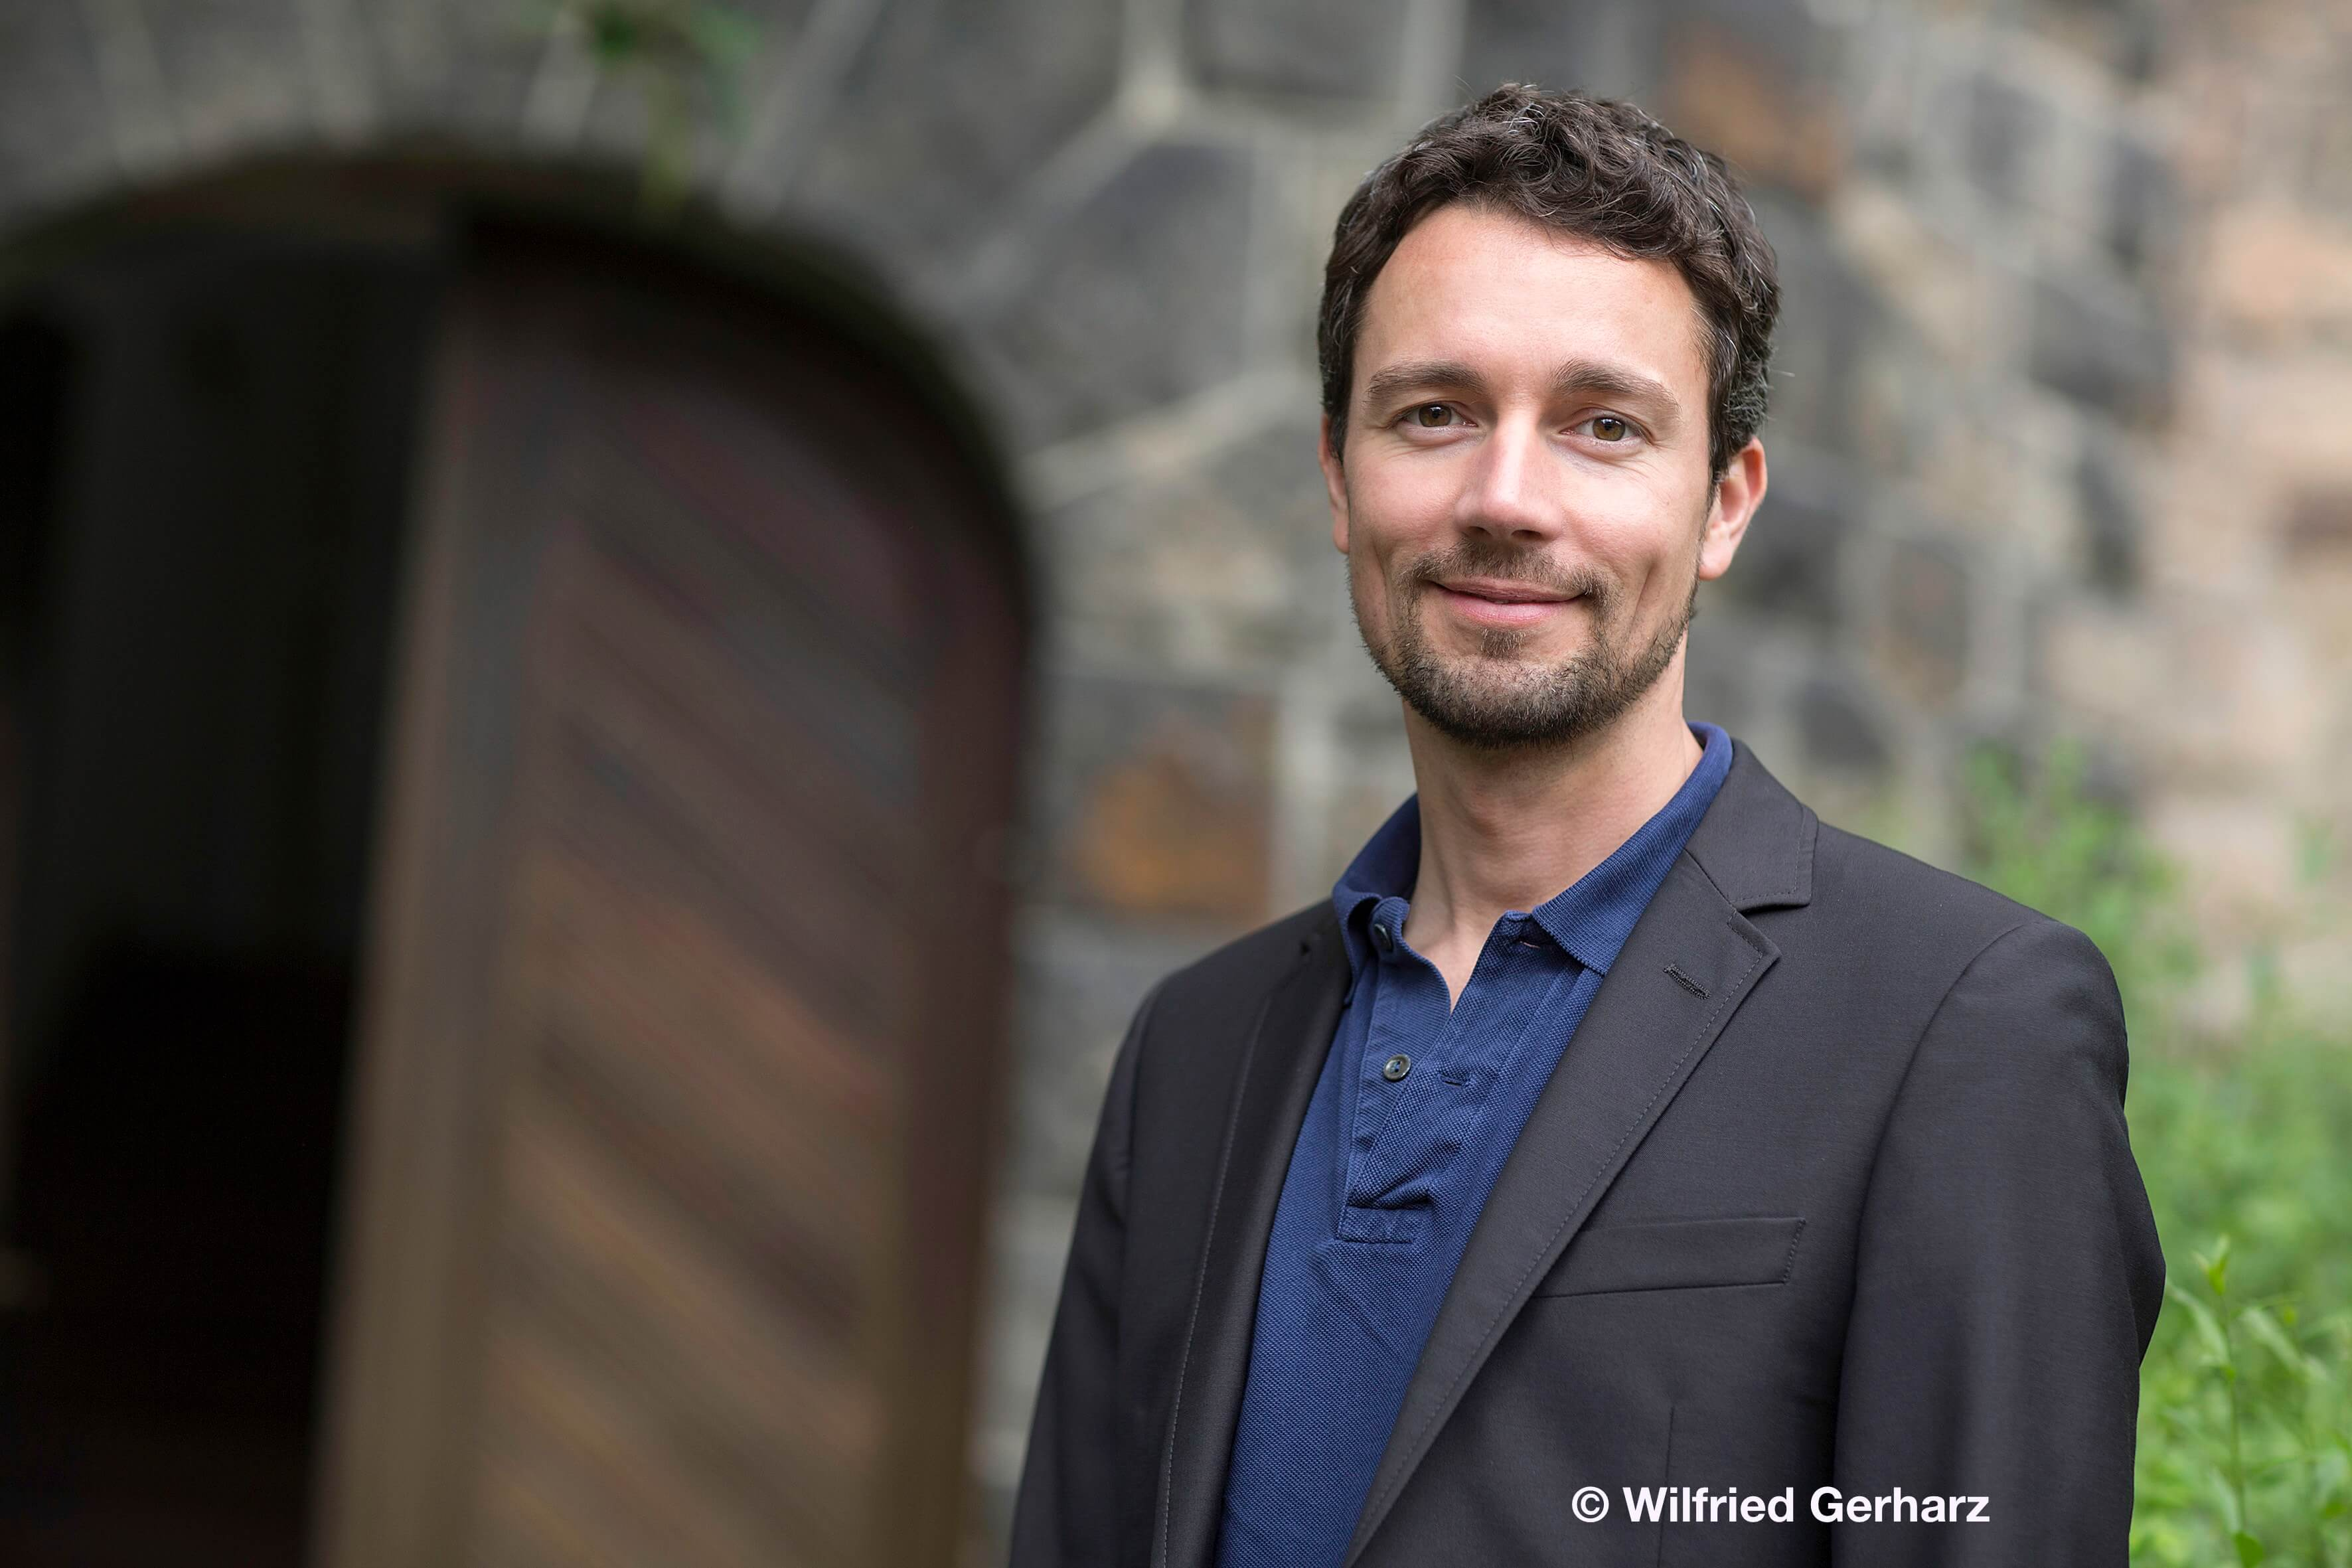 Prof. Dr. Manuel Tusch